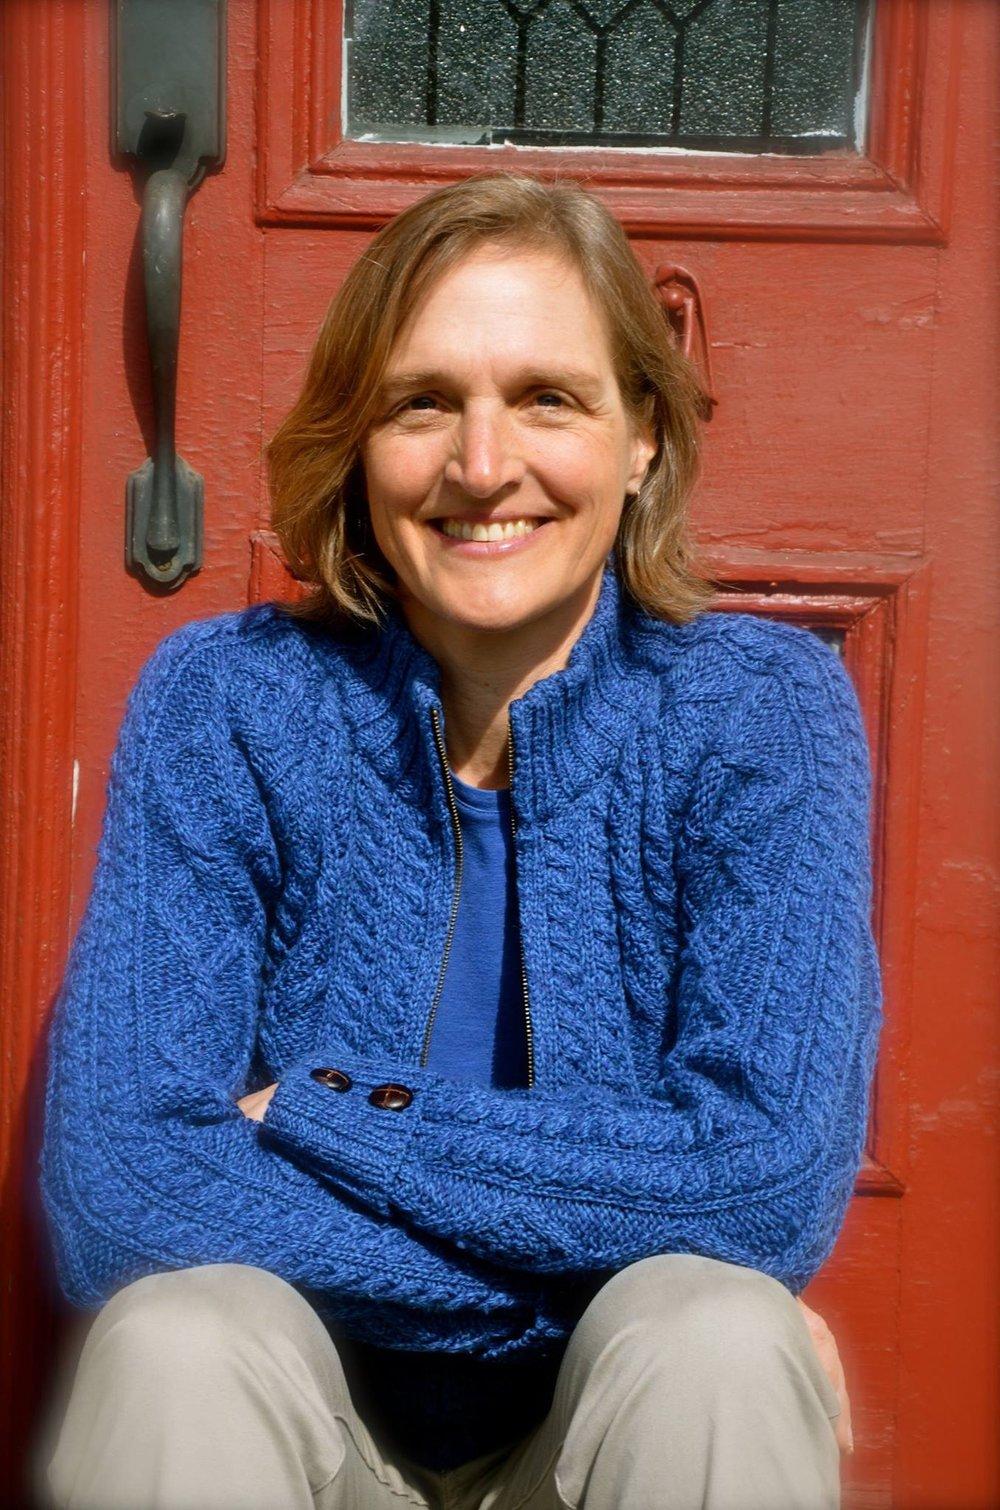 Dr. Heather Tallman Ruhm, Integrative Medical Doctor